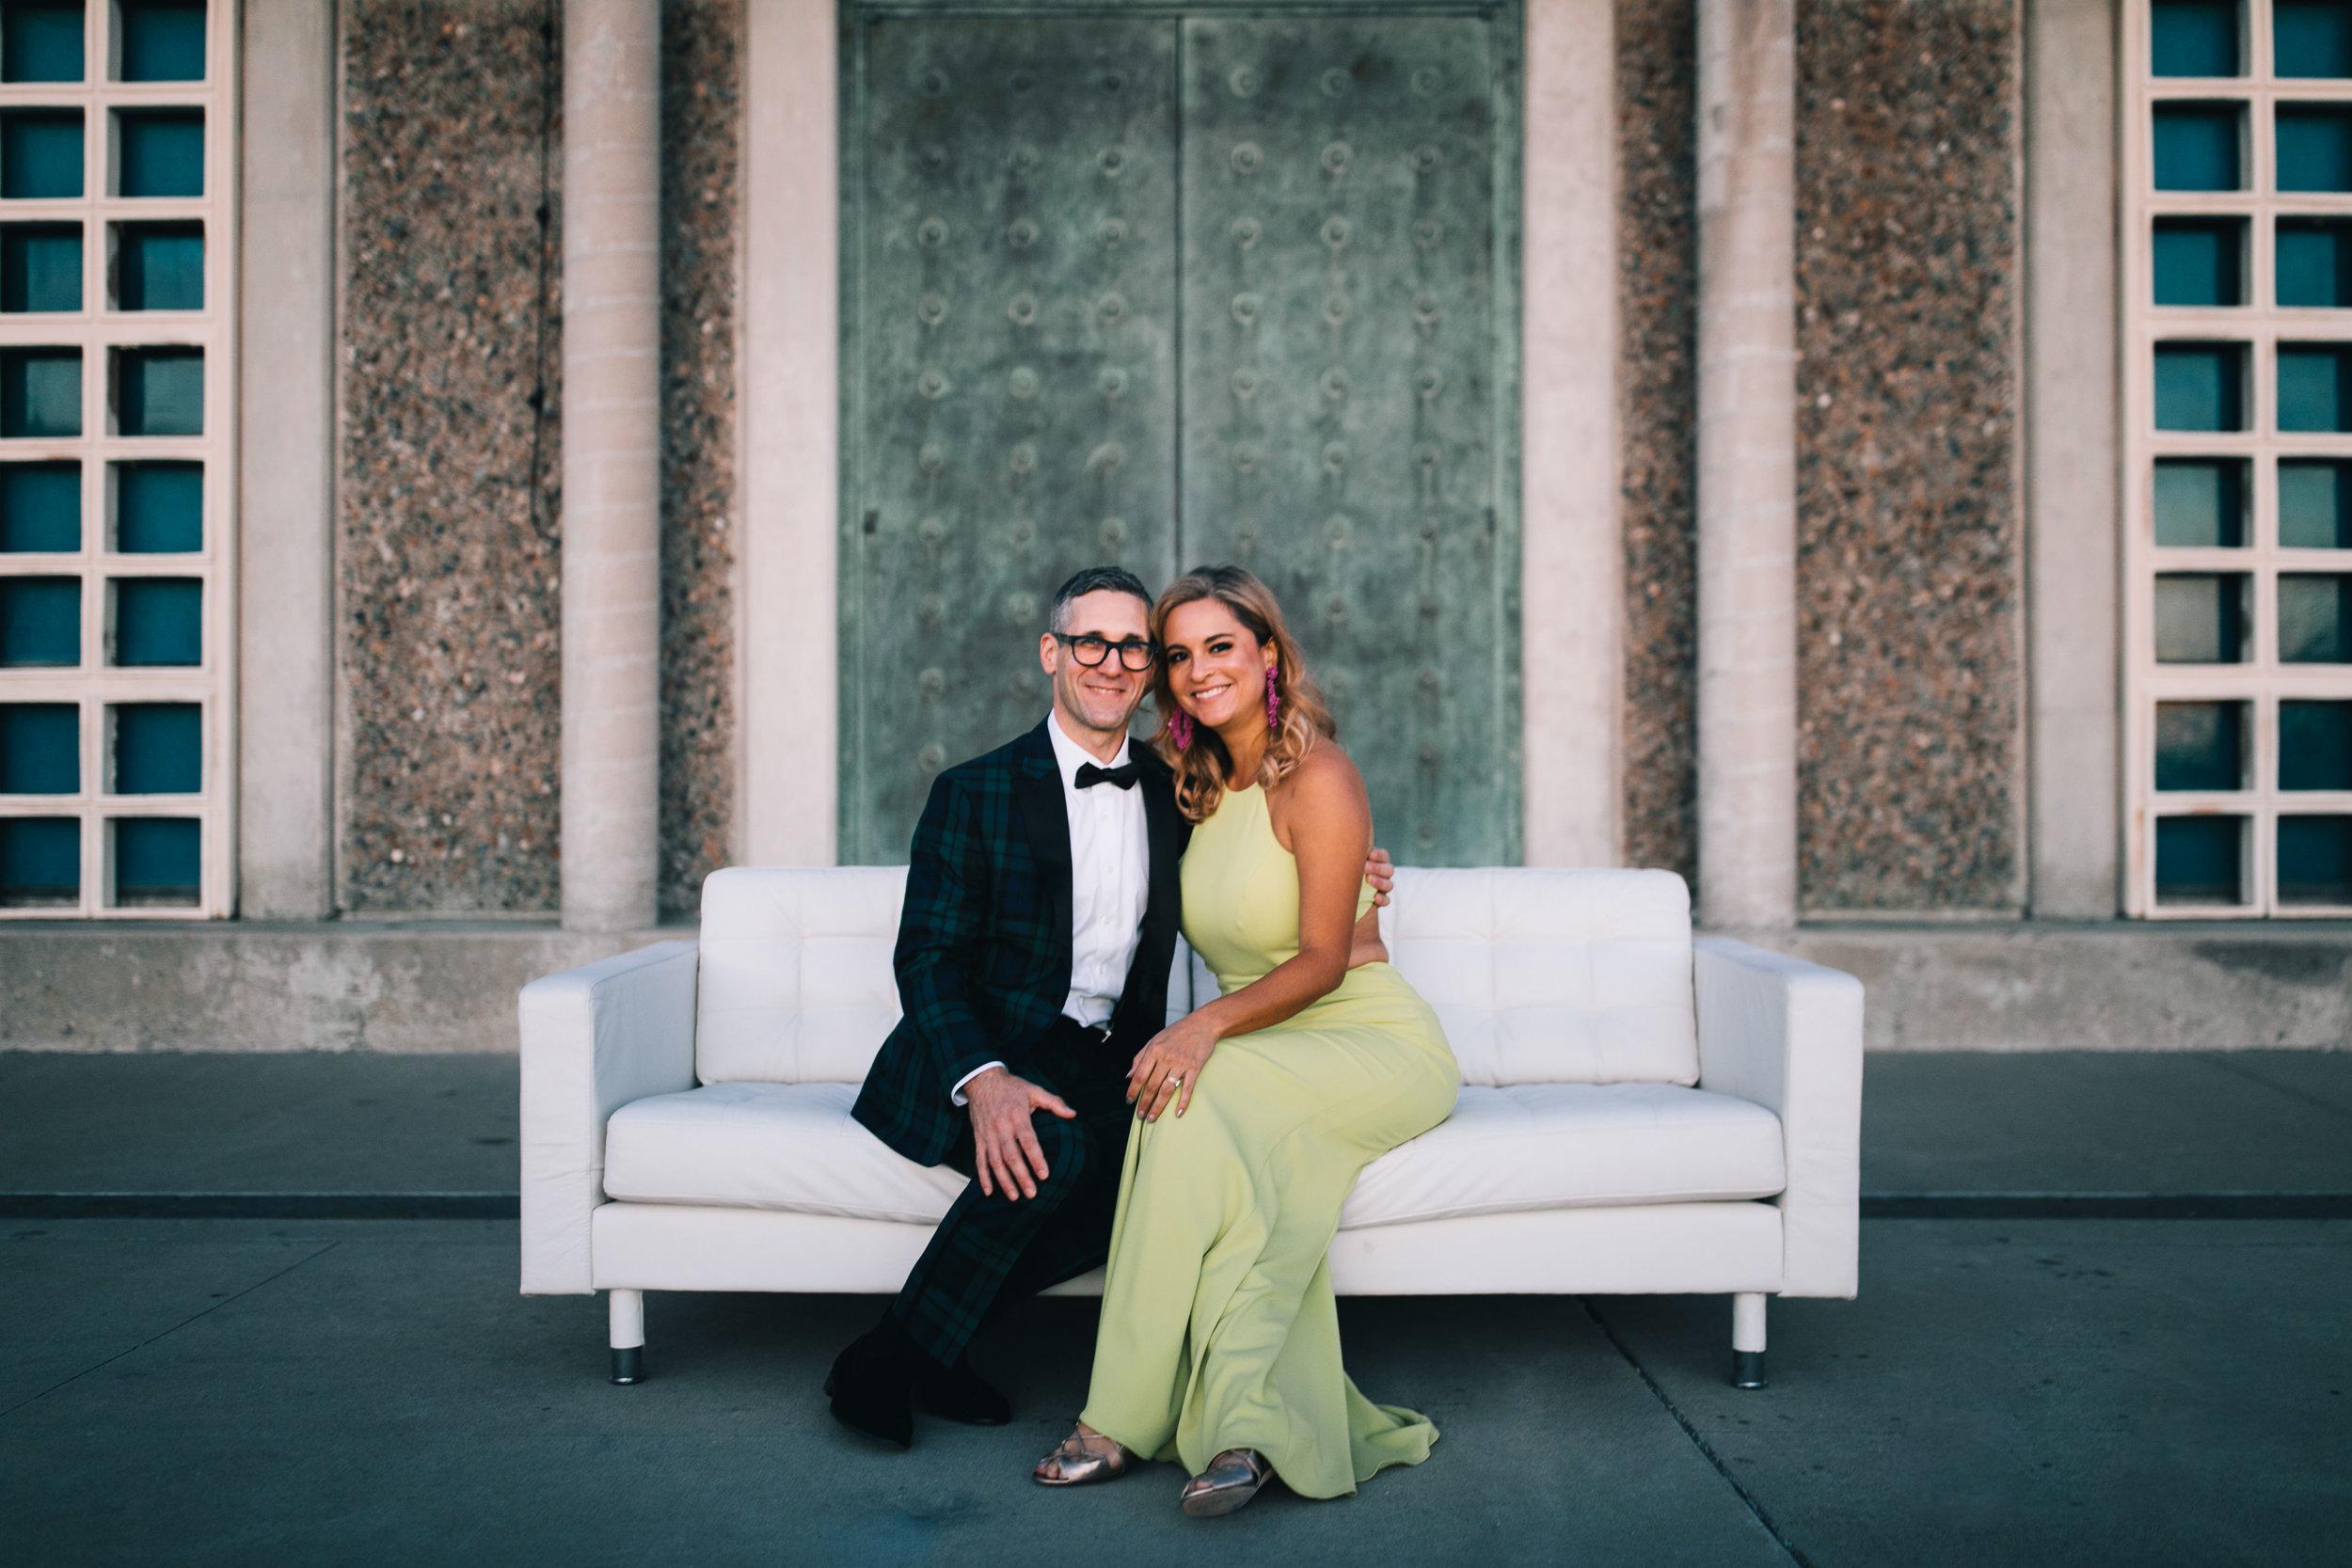 2018.09.08 Litsa and Sofo Greek Wedding Sneak Peak-19.jpg